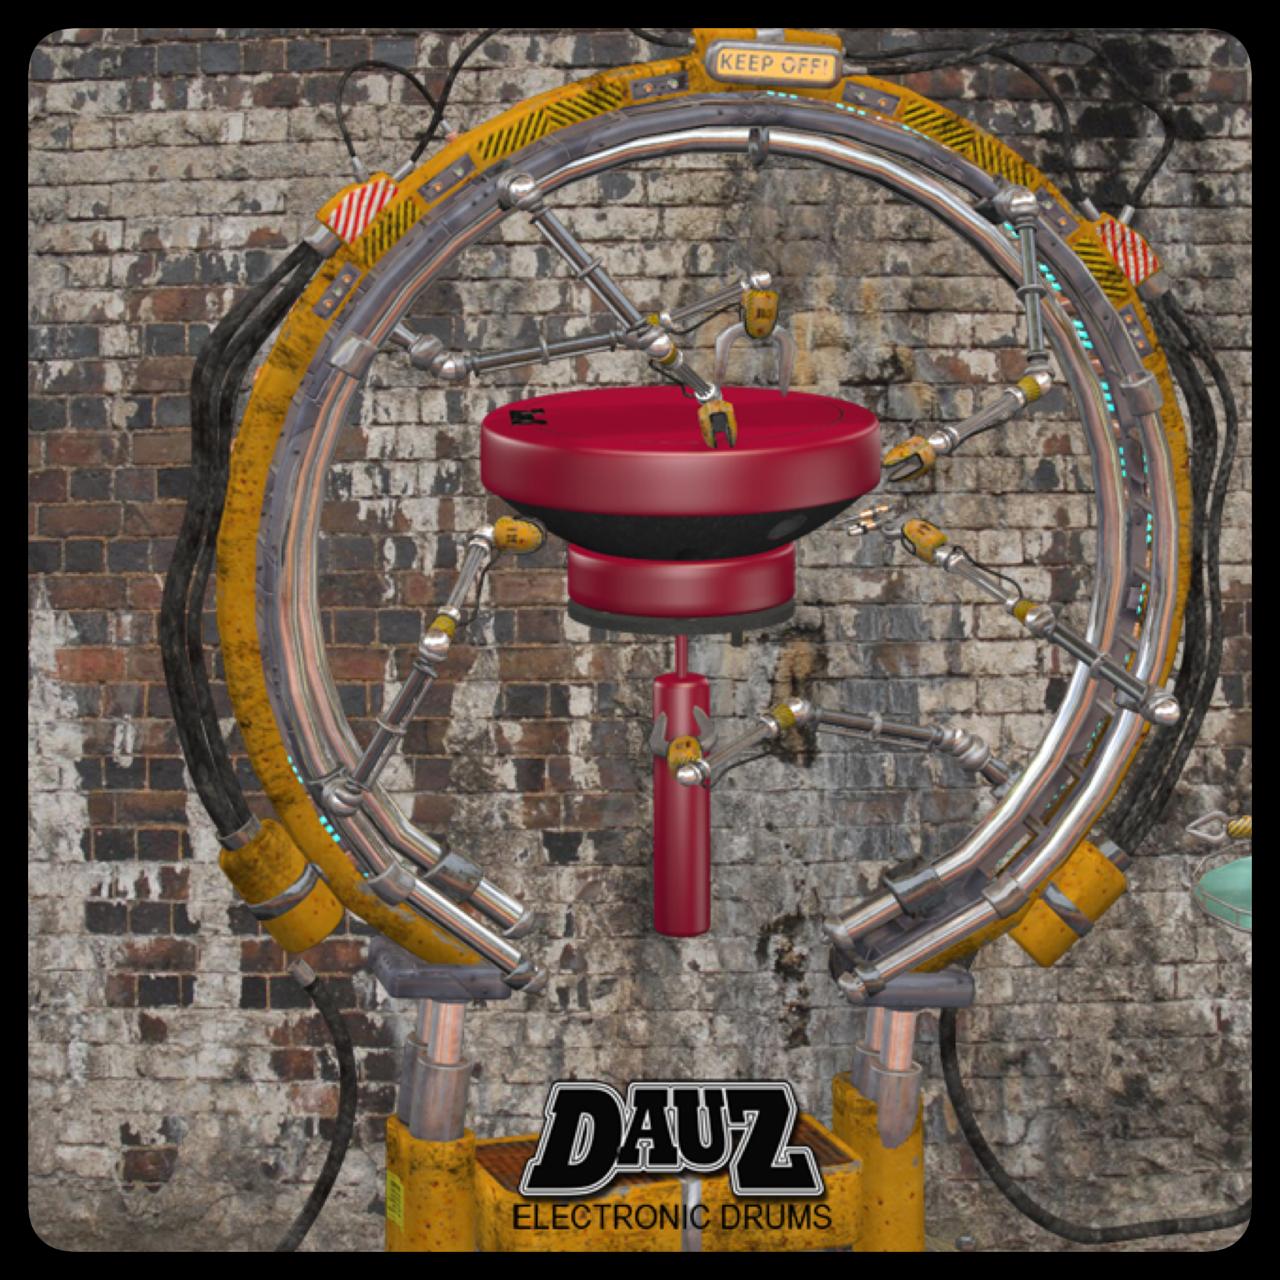 DAUZ drum cyber factory